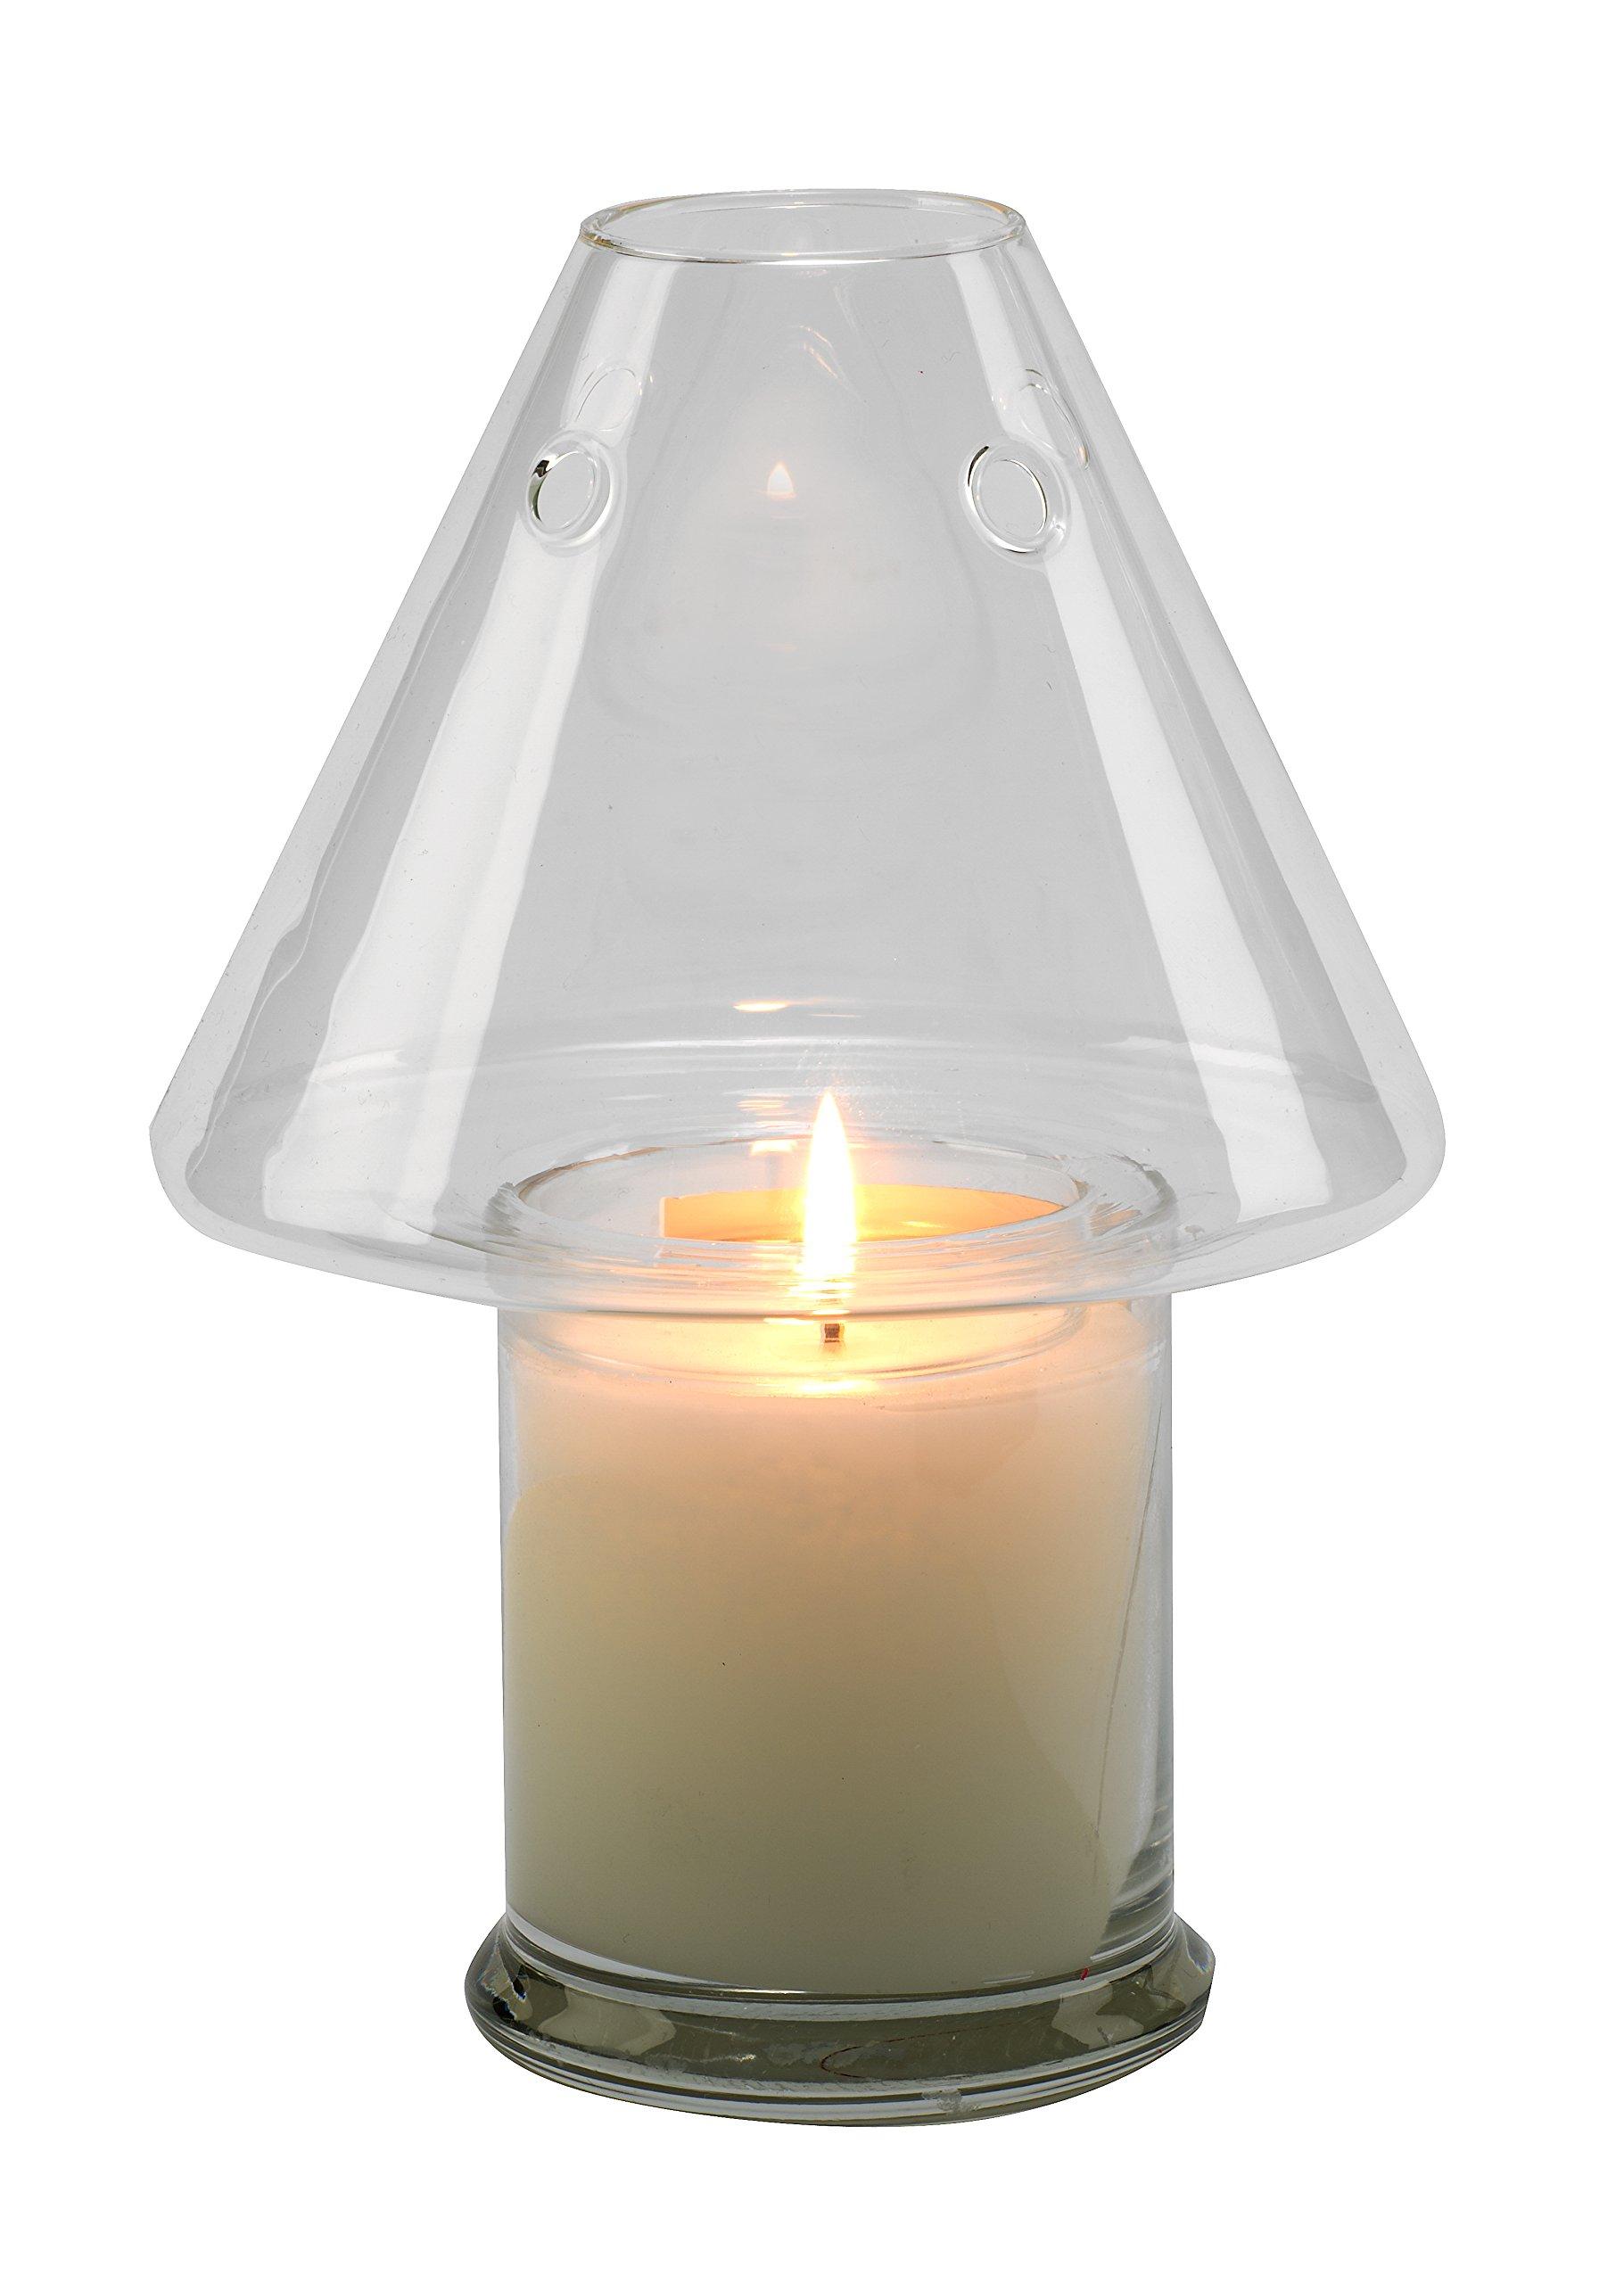 Biedermann & Sons Clear Glass Jar Candle Shade by Biedermann & Sons